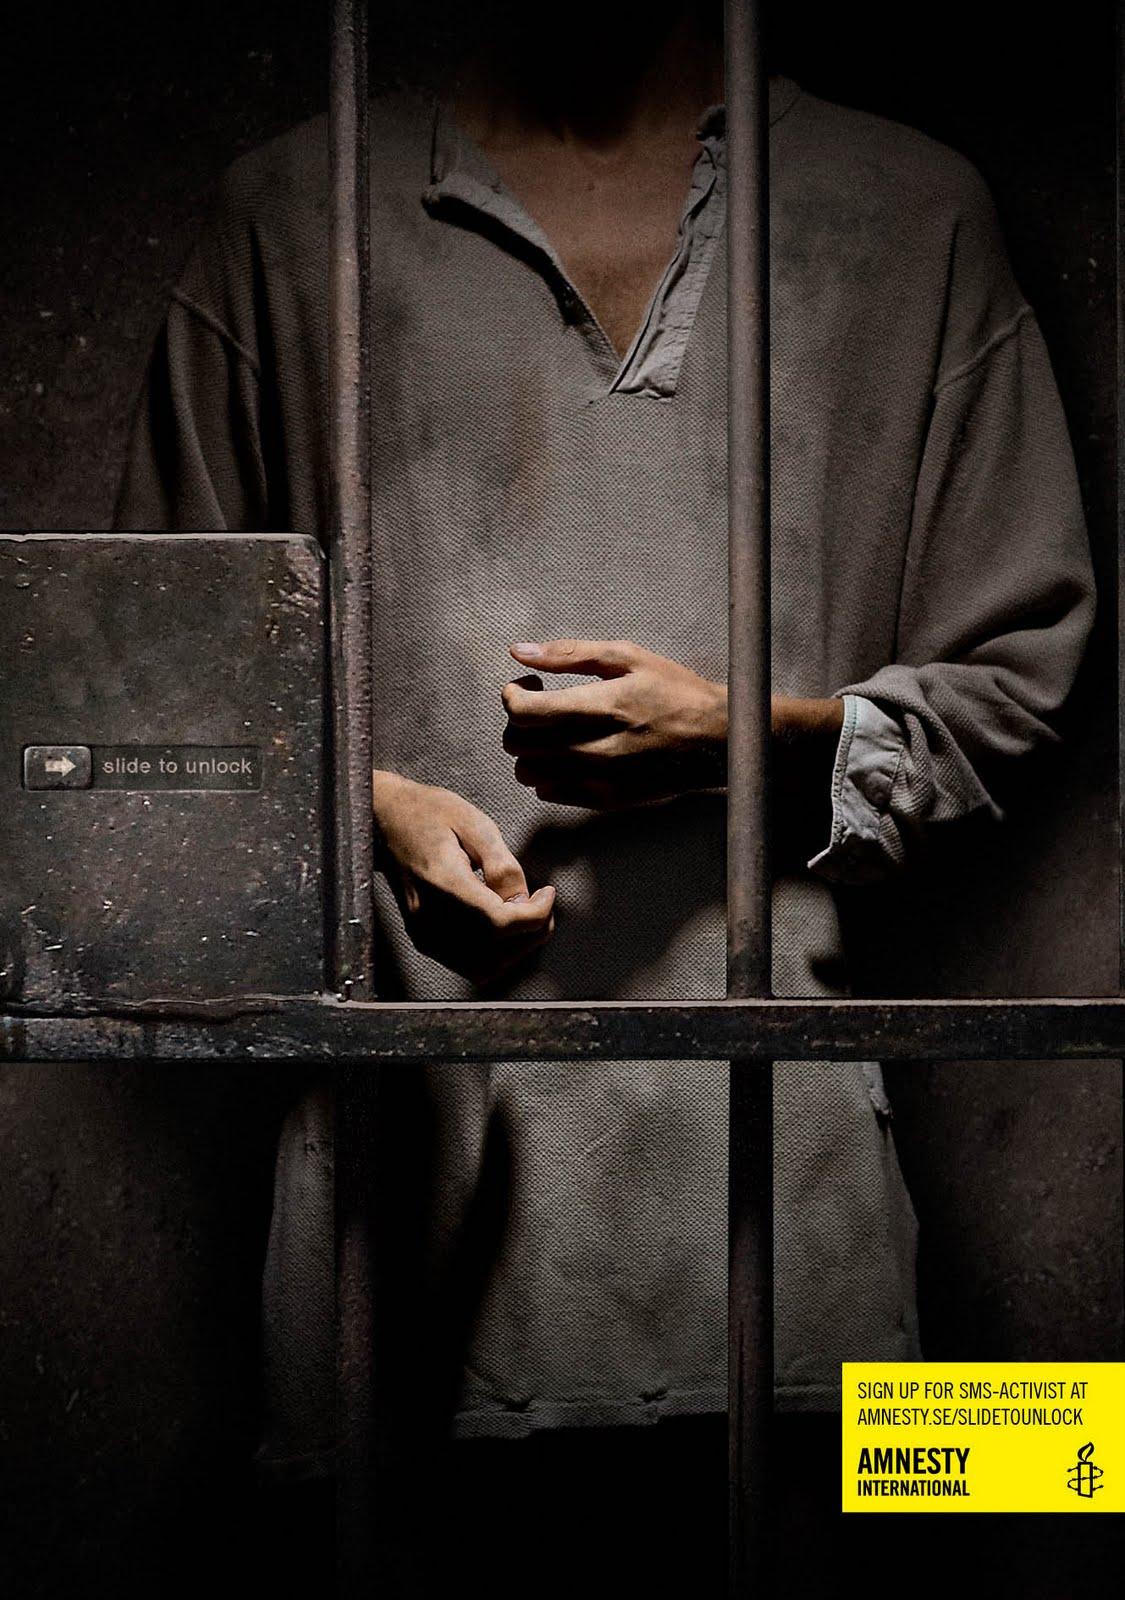 http://1.bp.blogspot.com/-jyWyVtMYhmQ/Trwvg0lPb6I/AAAAAAAAU3k/bOSymzfU0YY/s1600/amnesty_print_bars.jpg